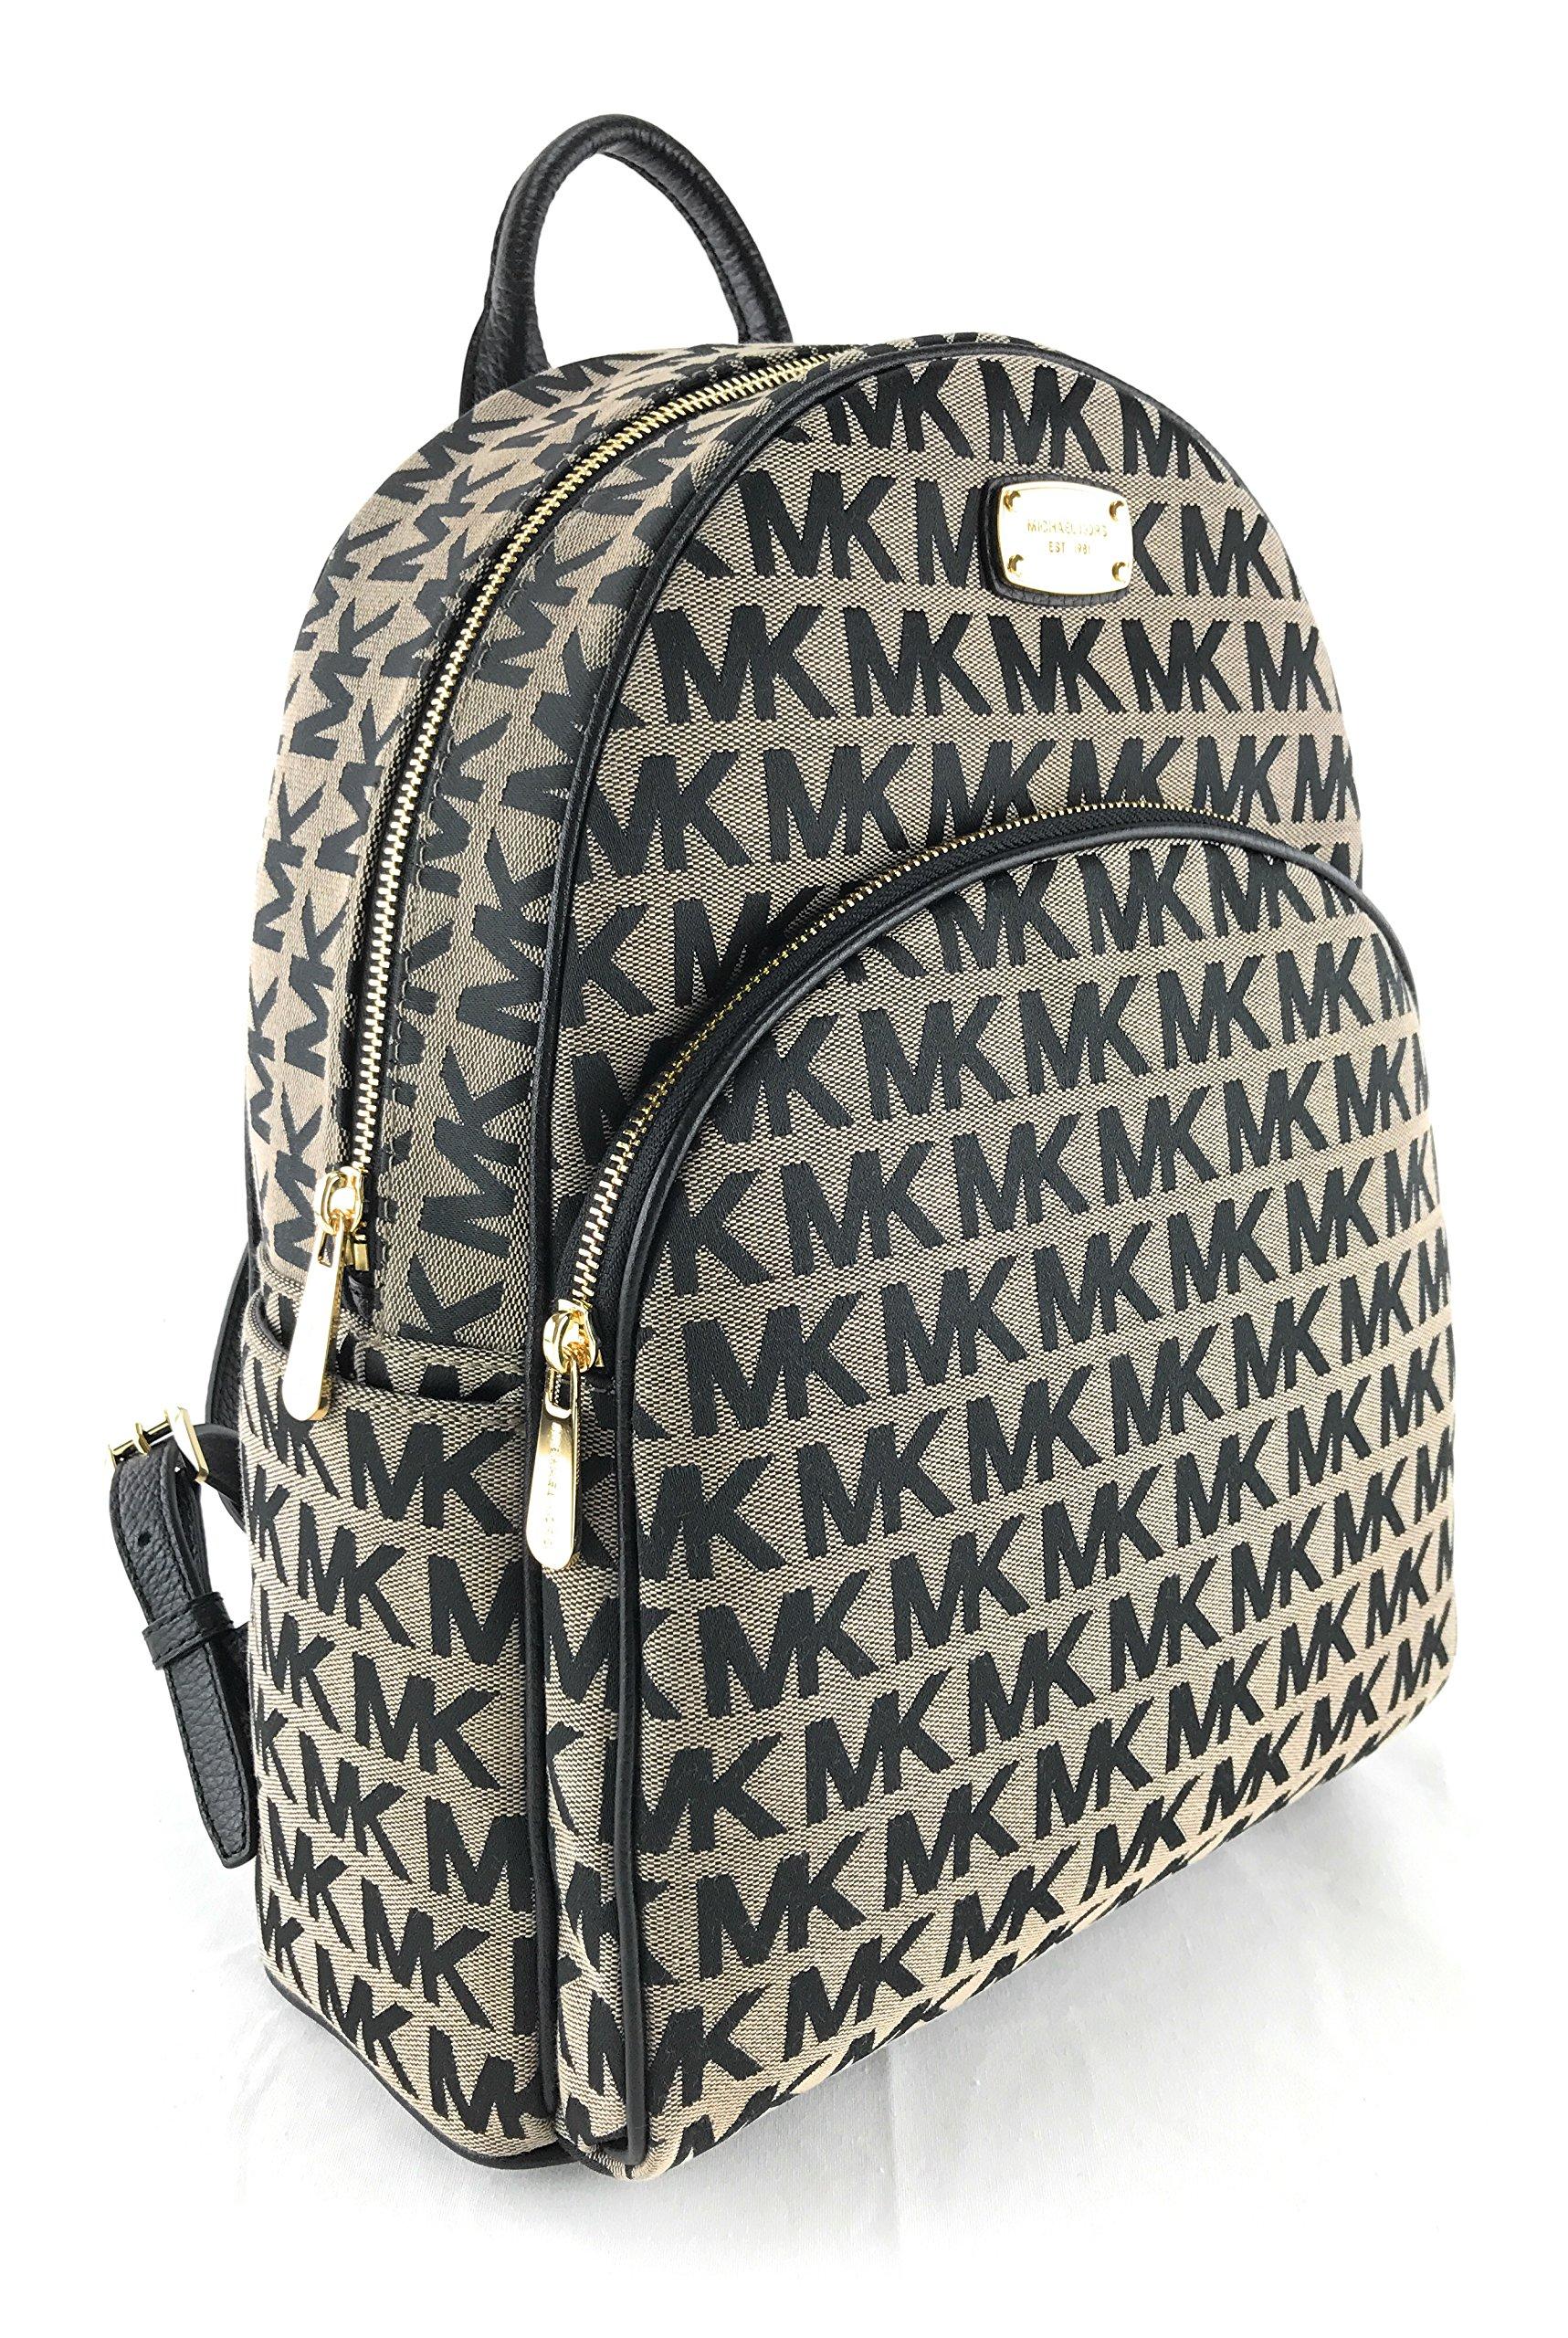 Michael Kors Abbey Large Jet Set Backpack BG / BLK / BLK